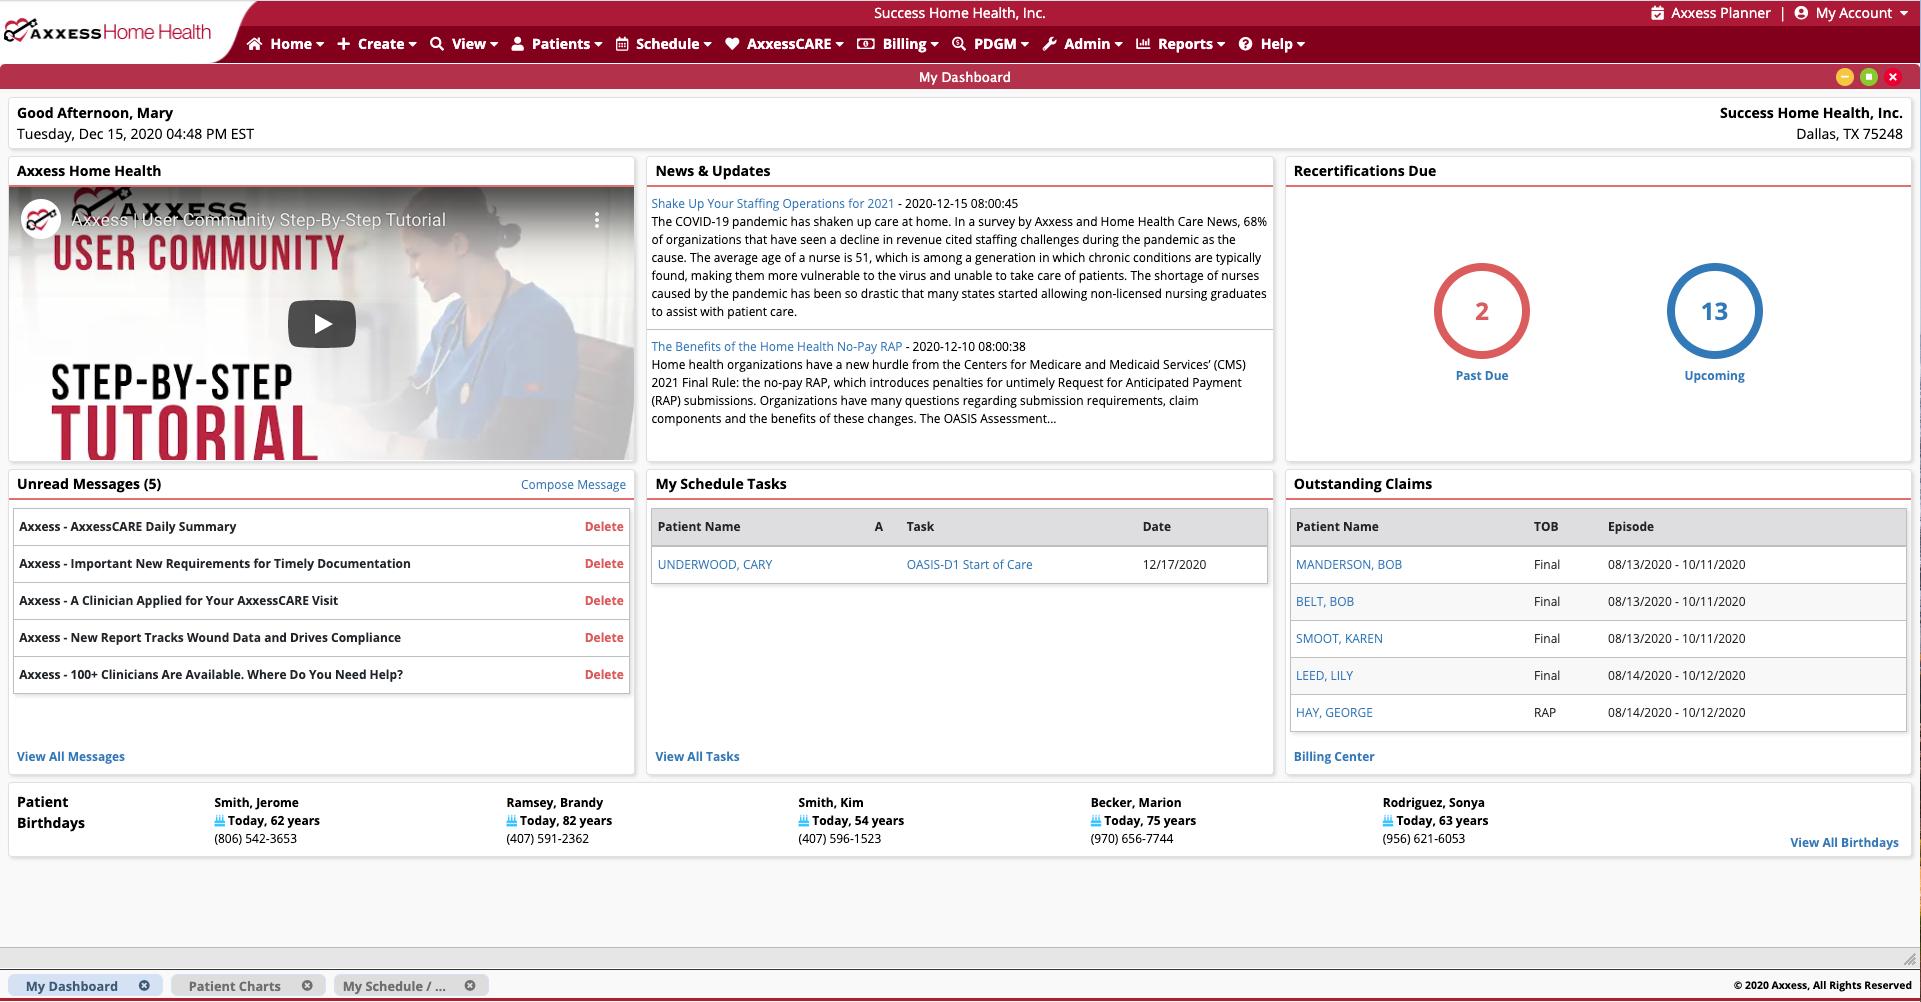 Axxess Home Health Software - Home Health Software Dashboard